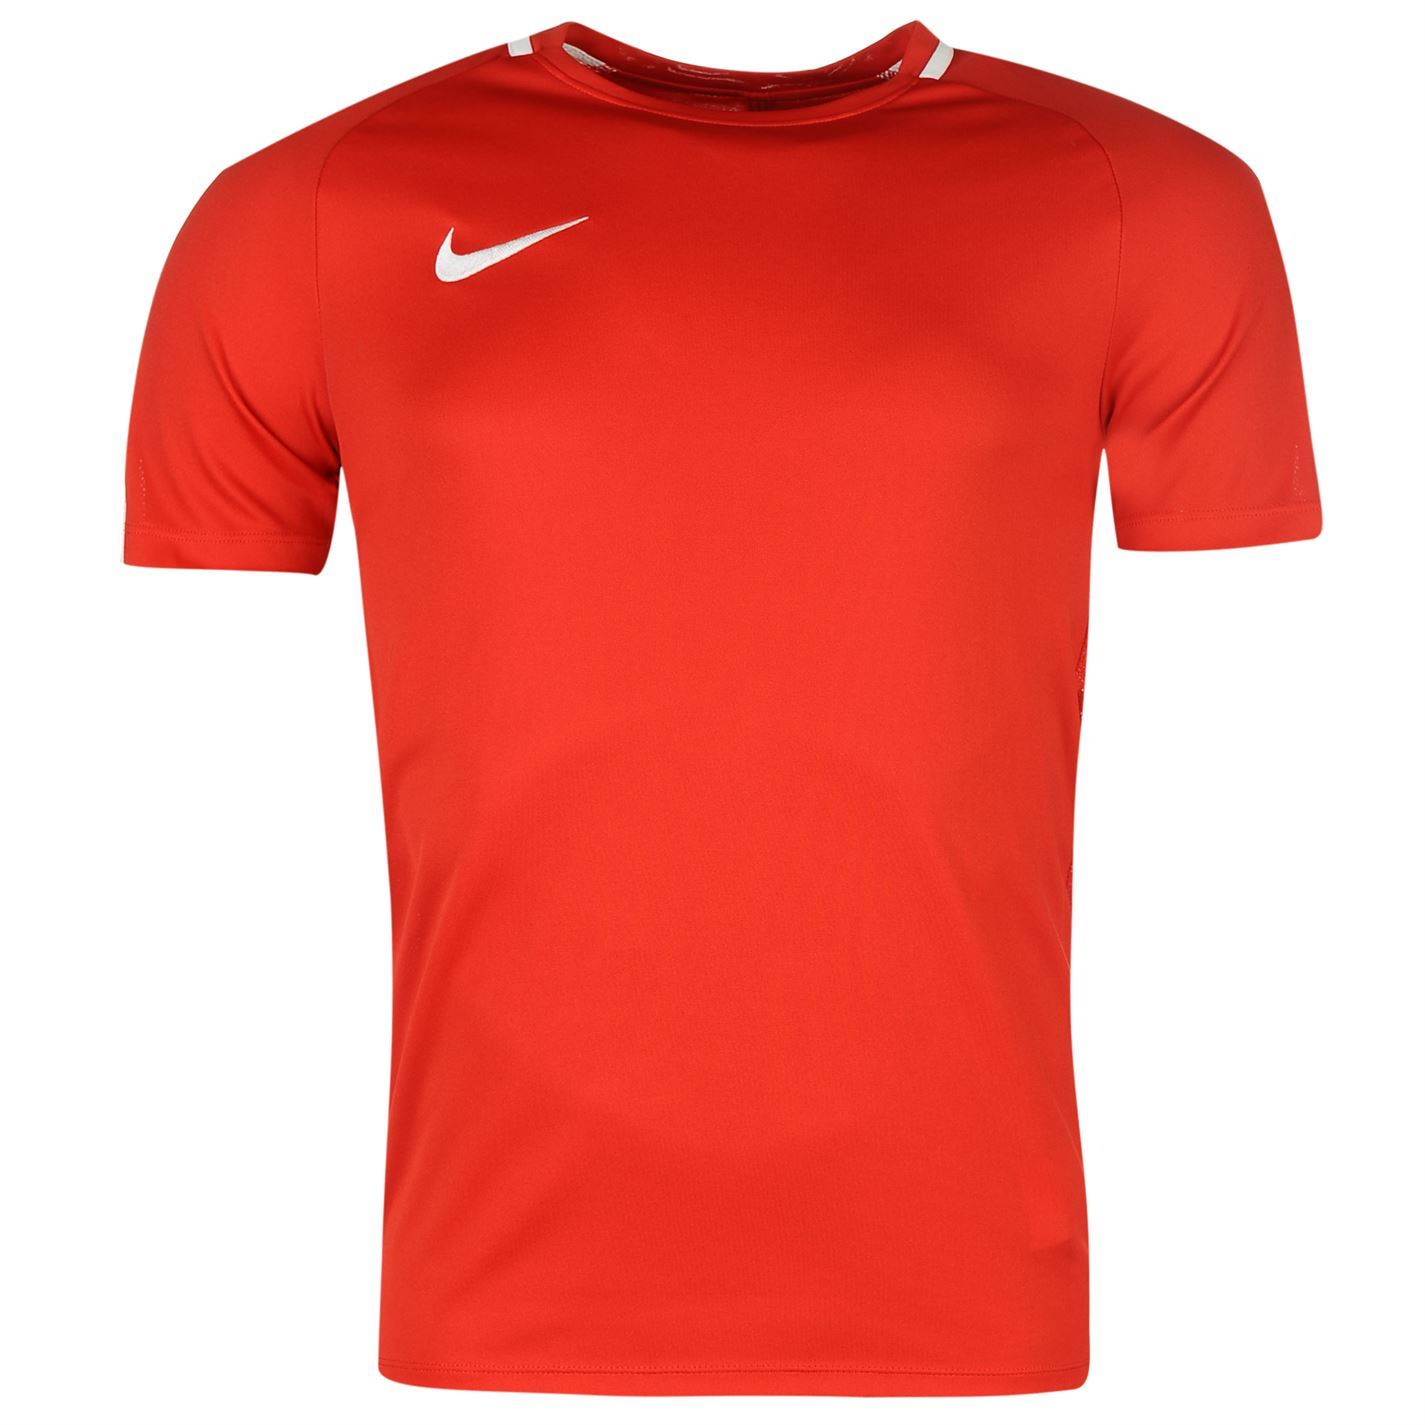 Íncubo sí mismo Monótono  Nike Academy Training T-Shirt Mens Red Football Soccer Top Tee Shirt   eBay